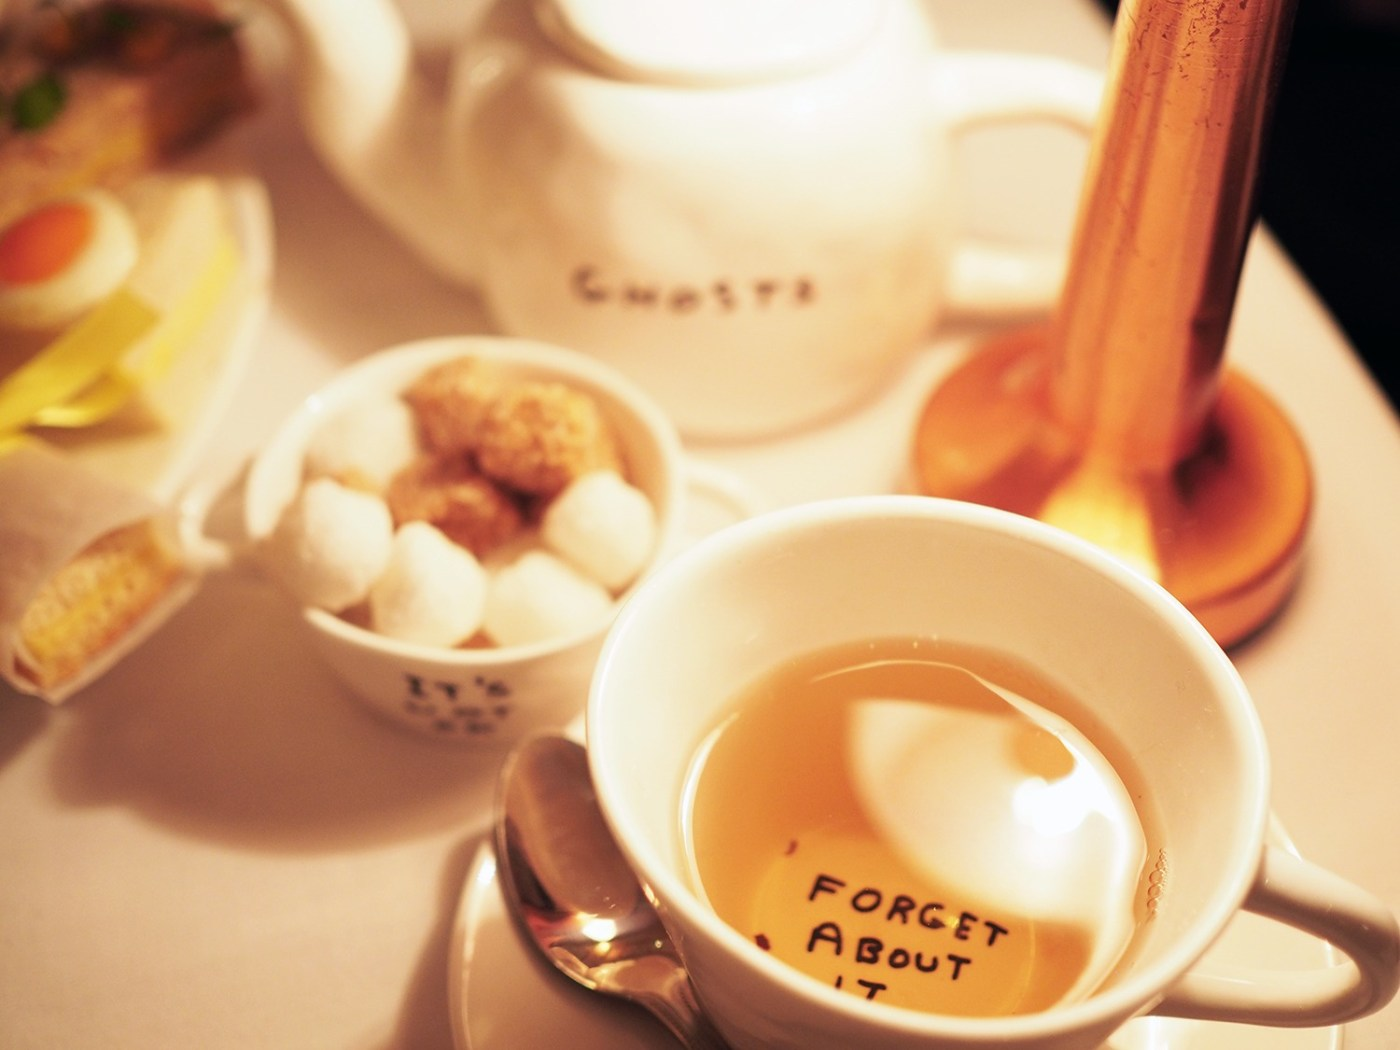 afternoon tea at sketch london - 21